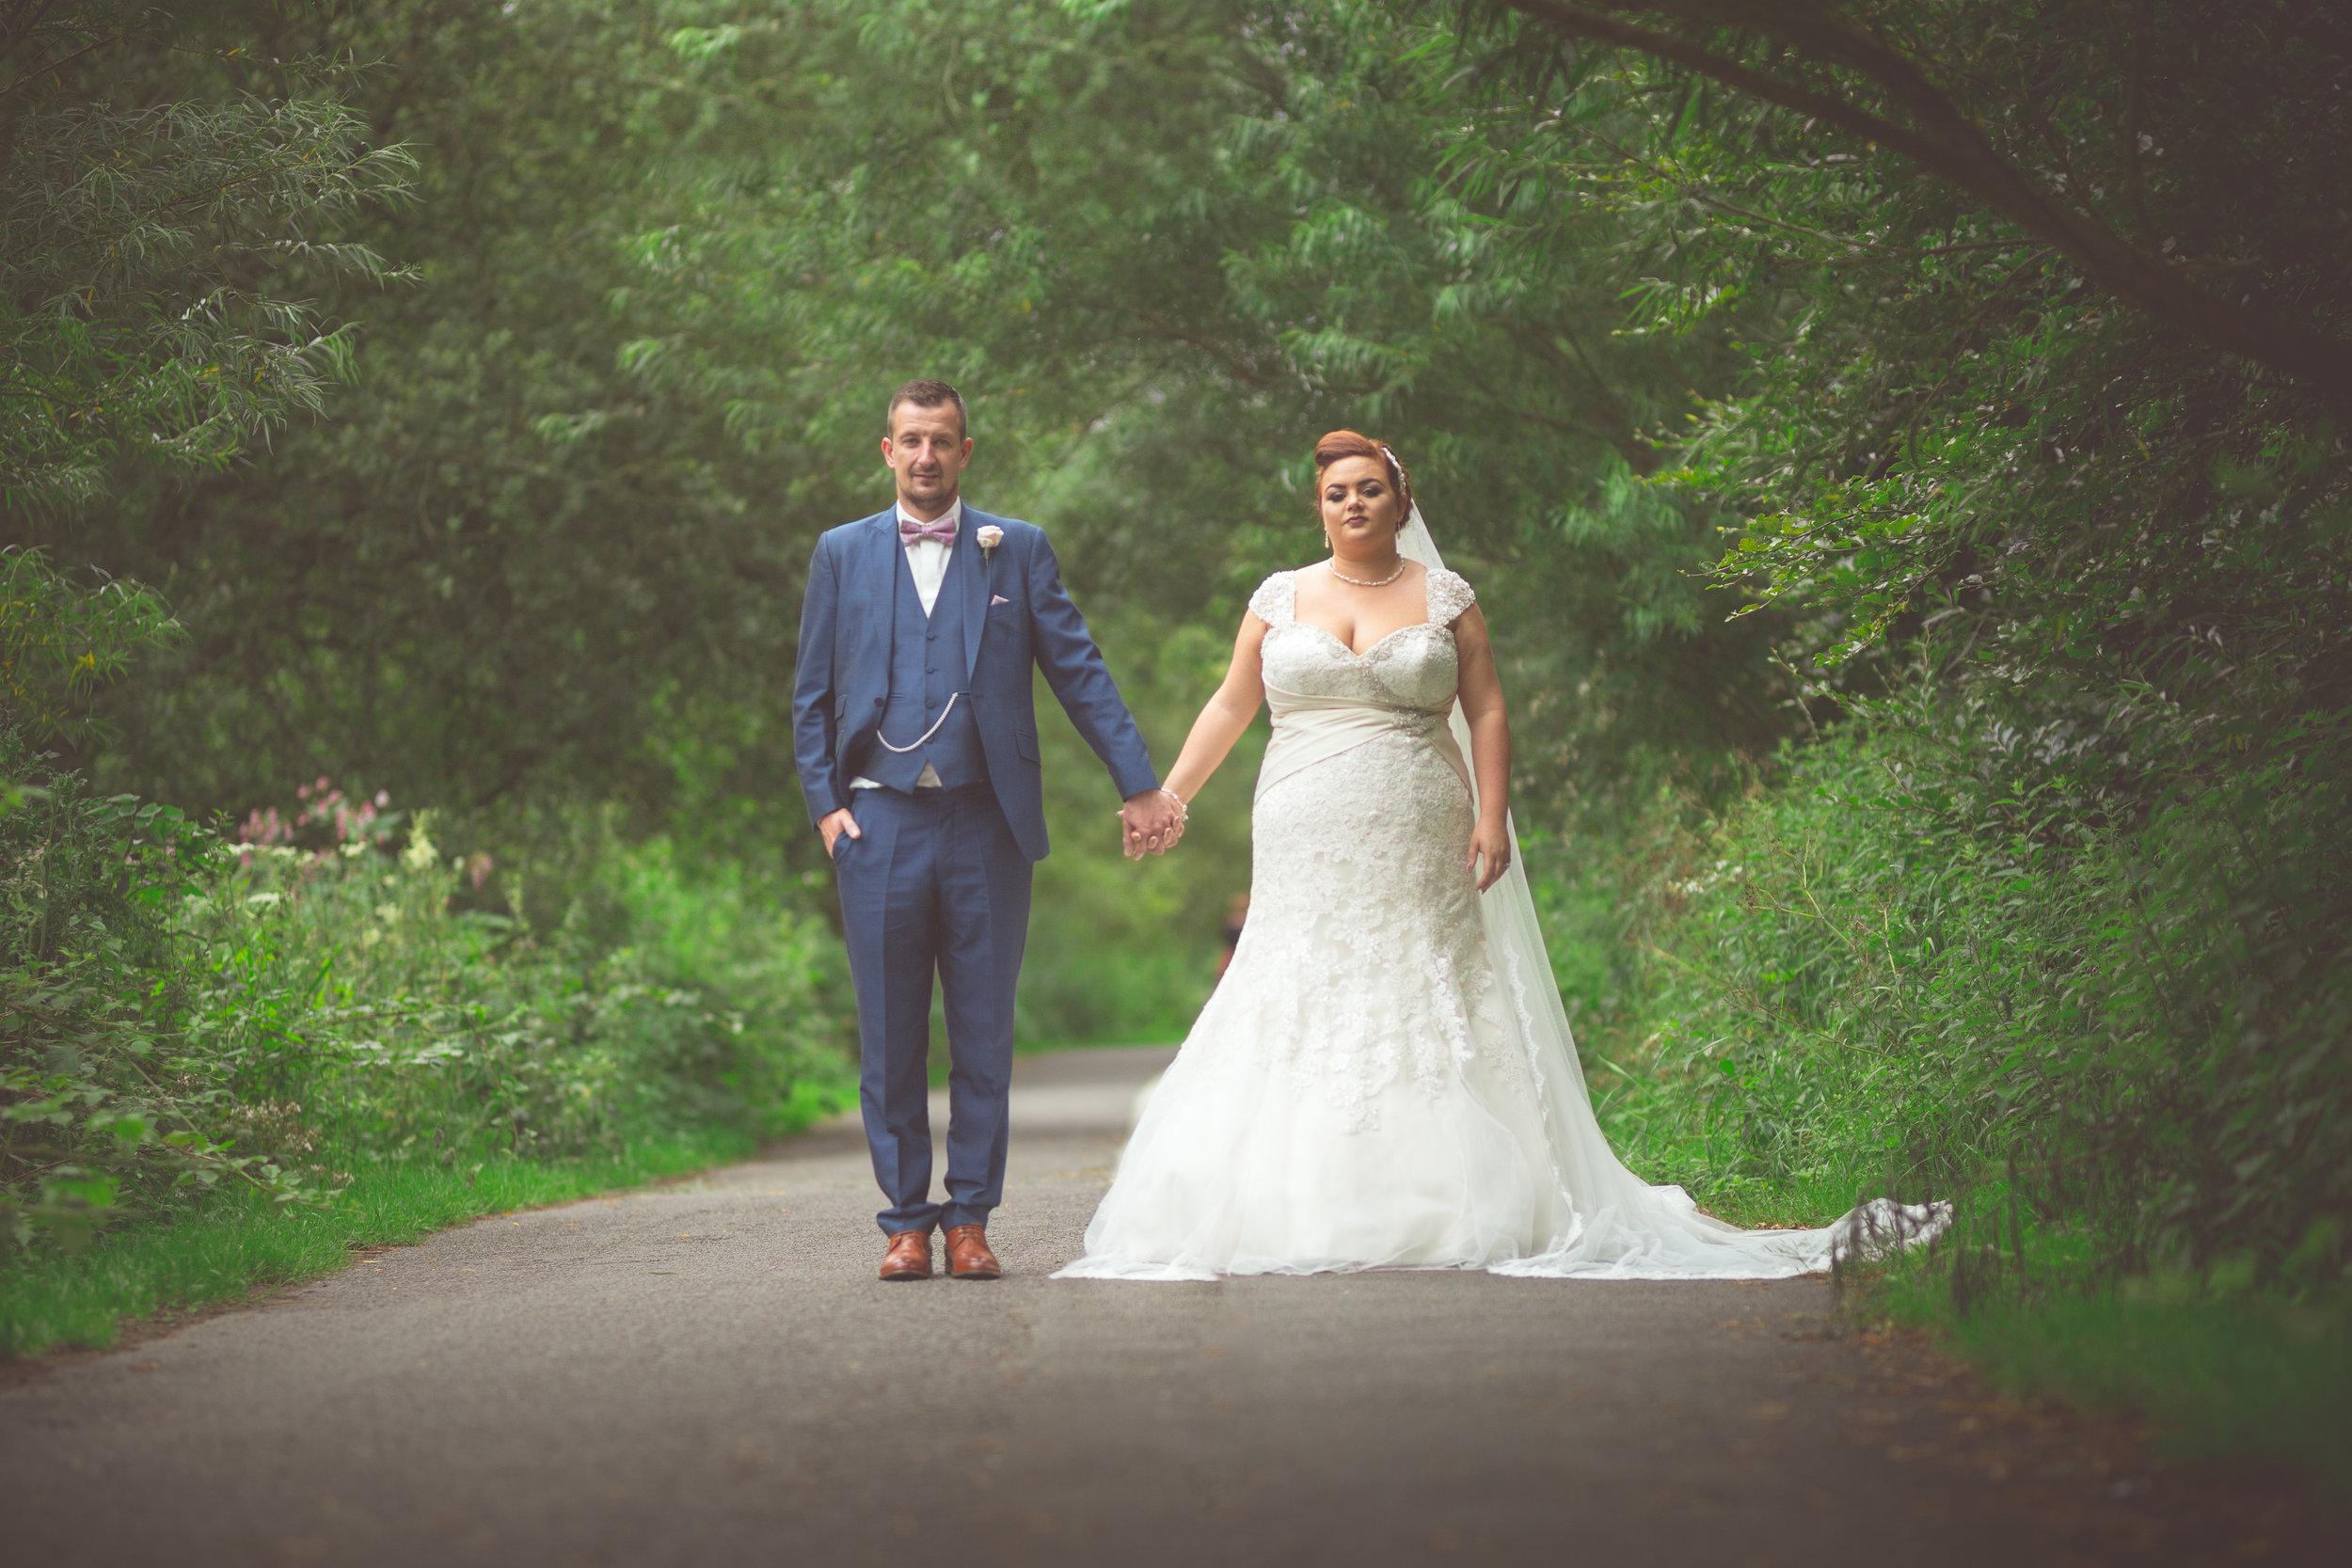 Antoinette & Stephen - Portraits   Brian McEwan Photography   Wedding Photographer Northern Ireland 32.jpg